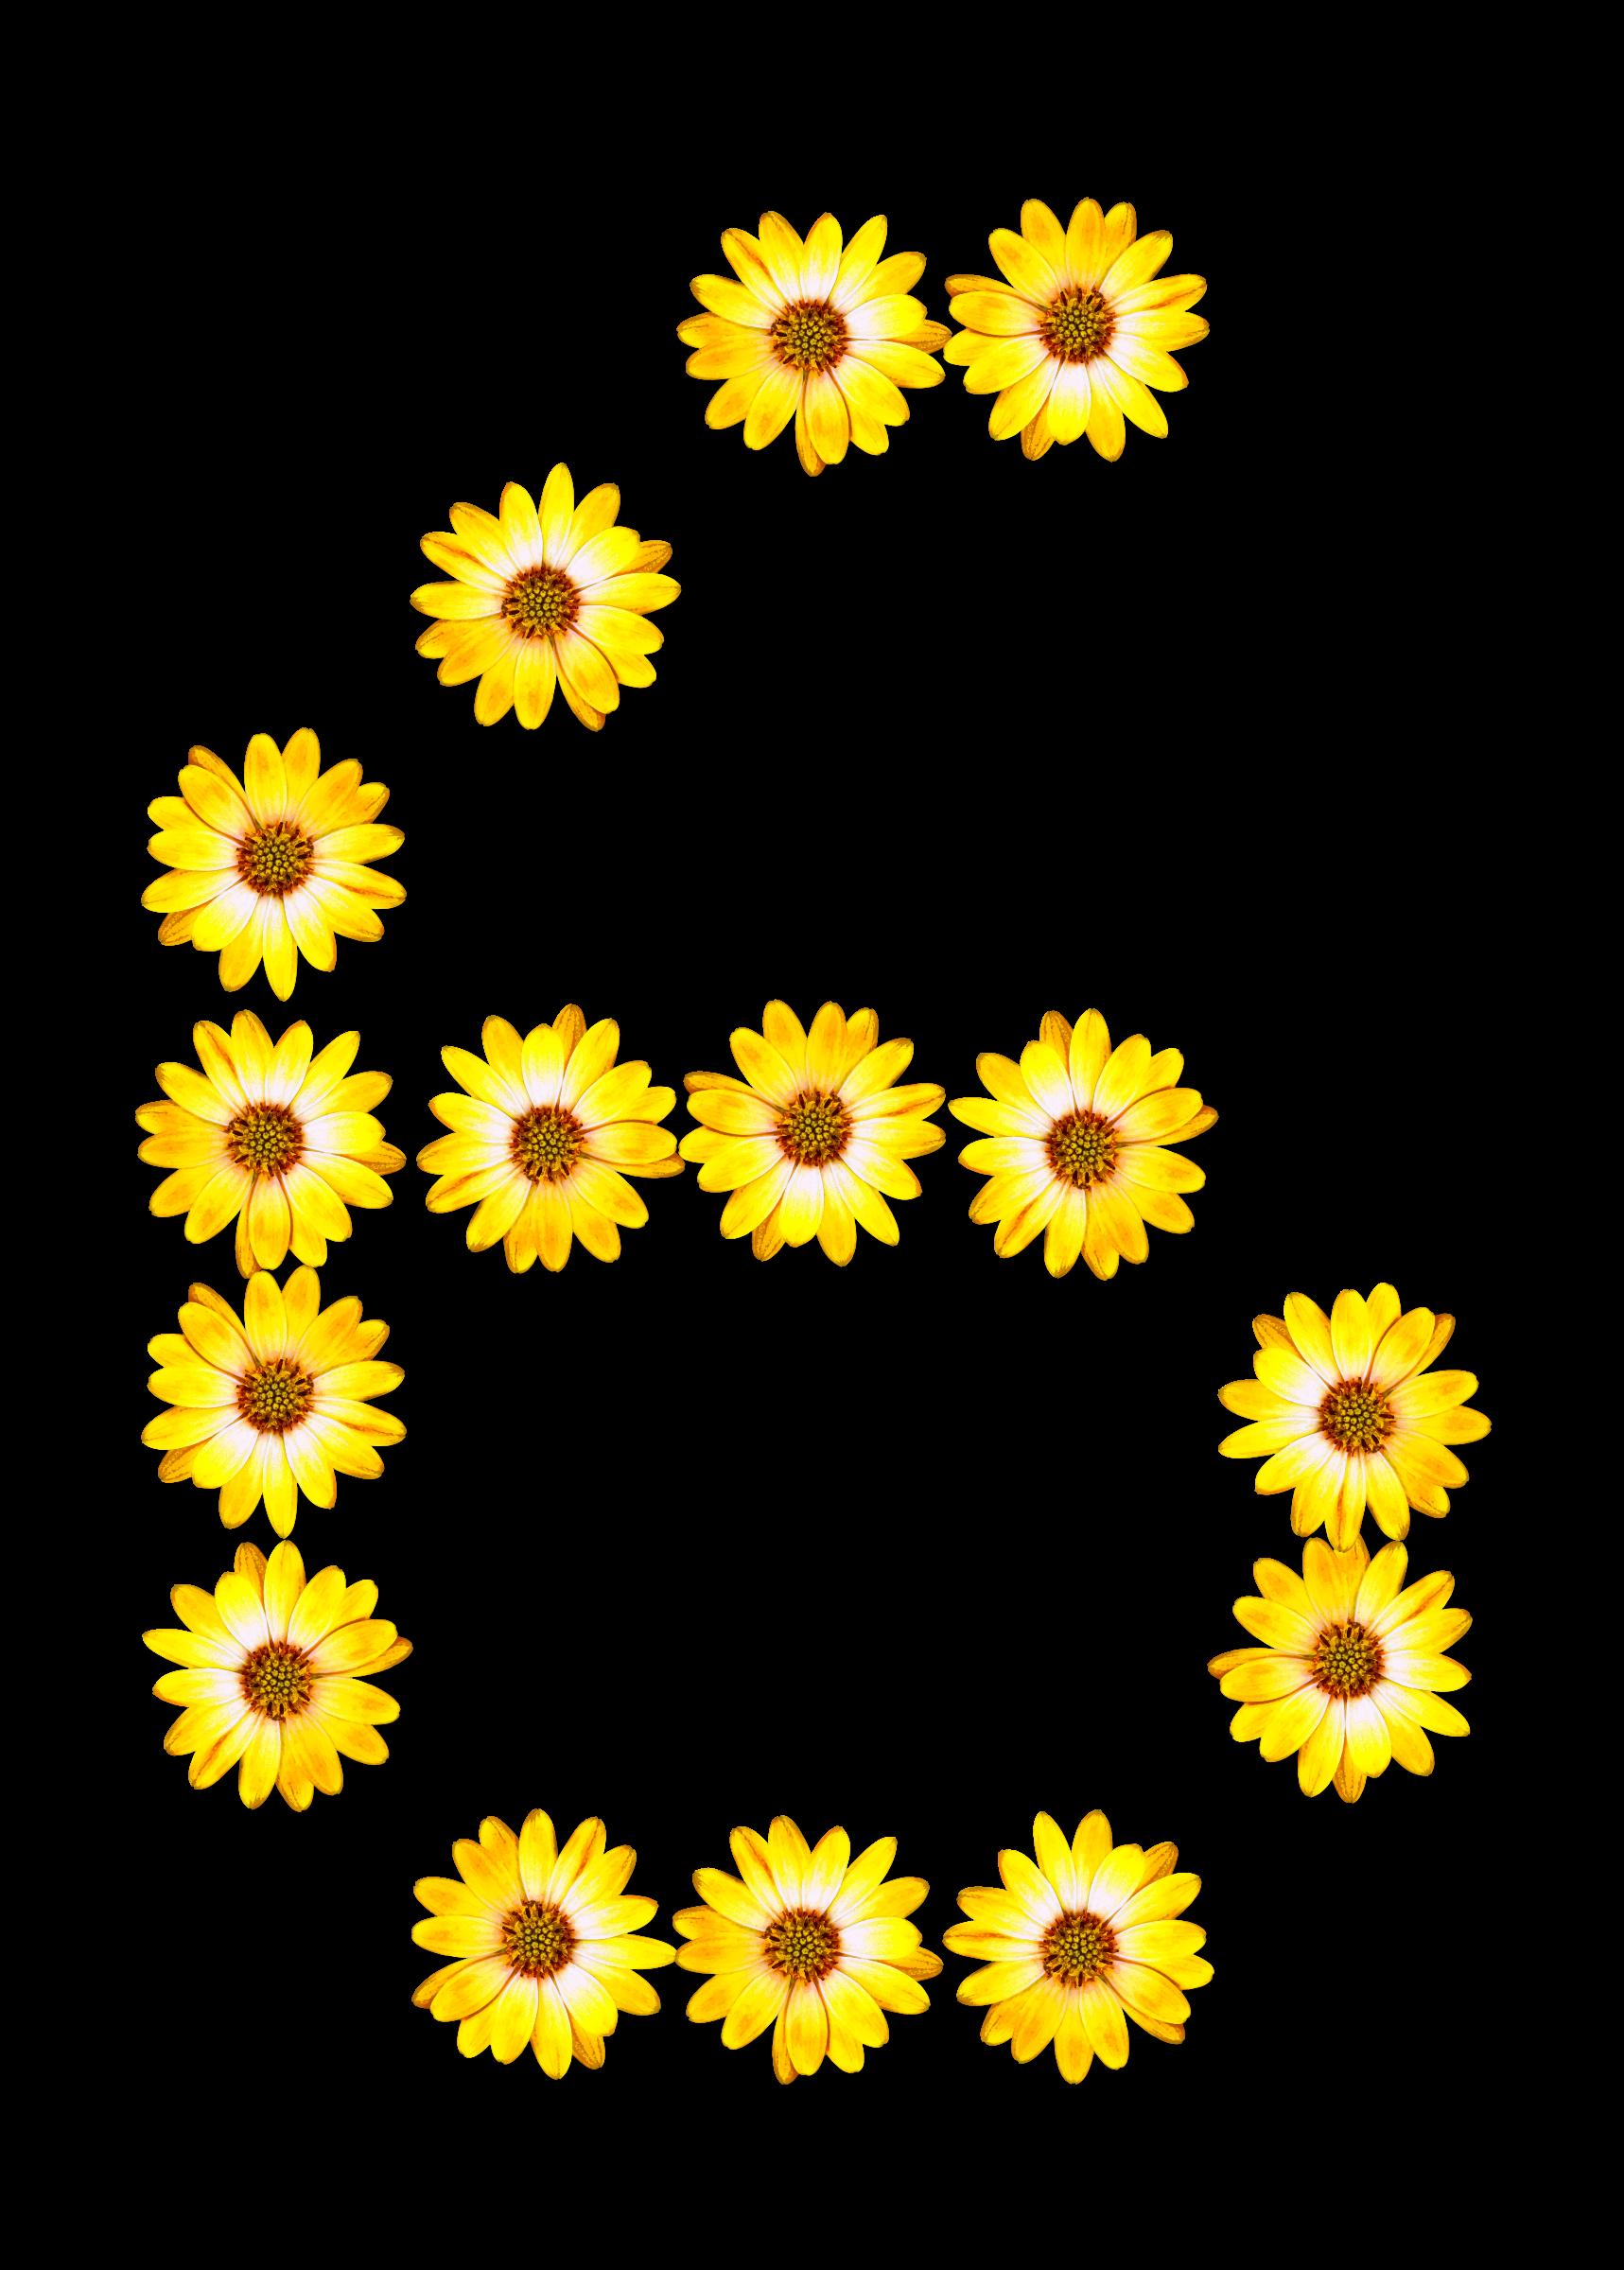 Floral alphabet big image. Daisies clipart smiley